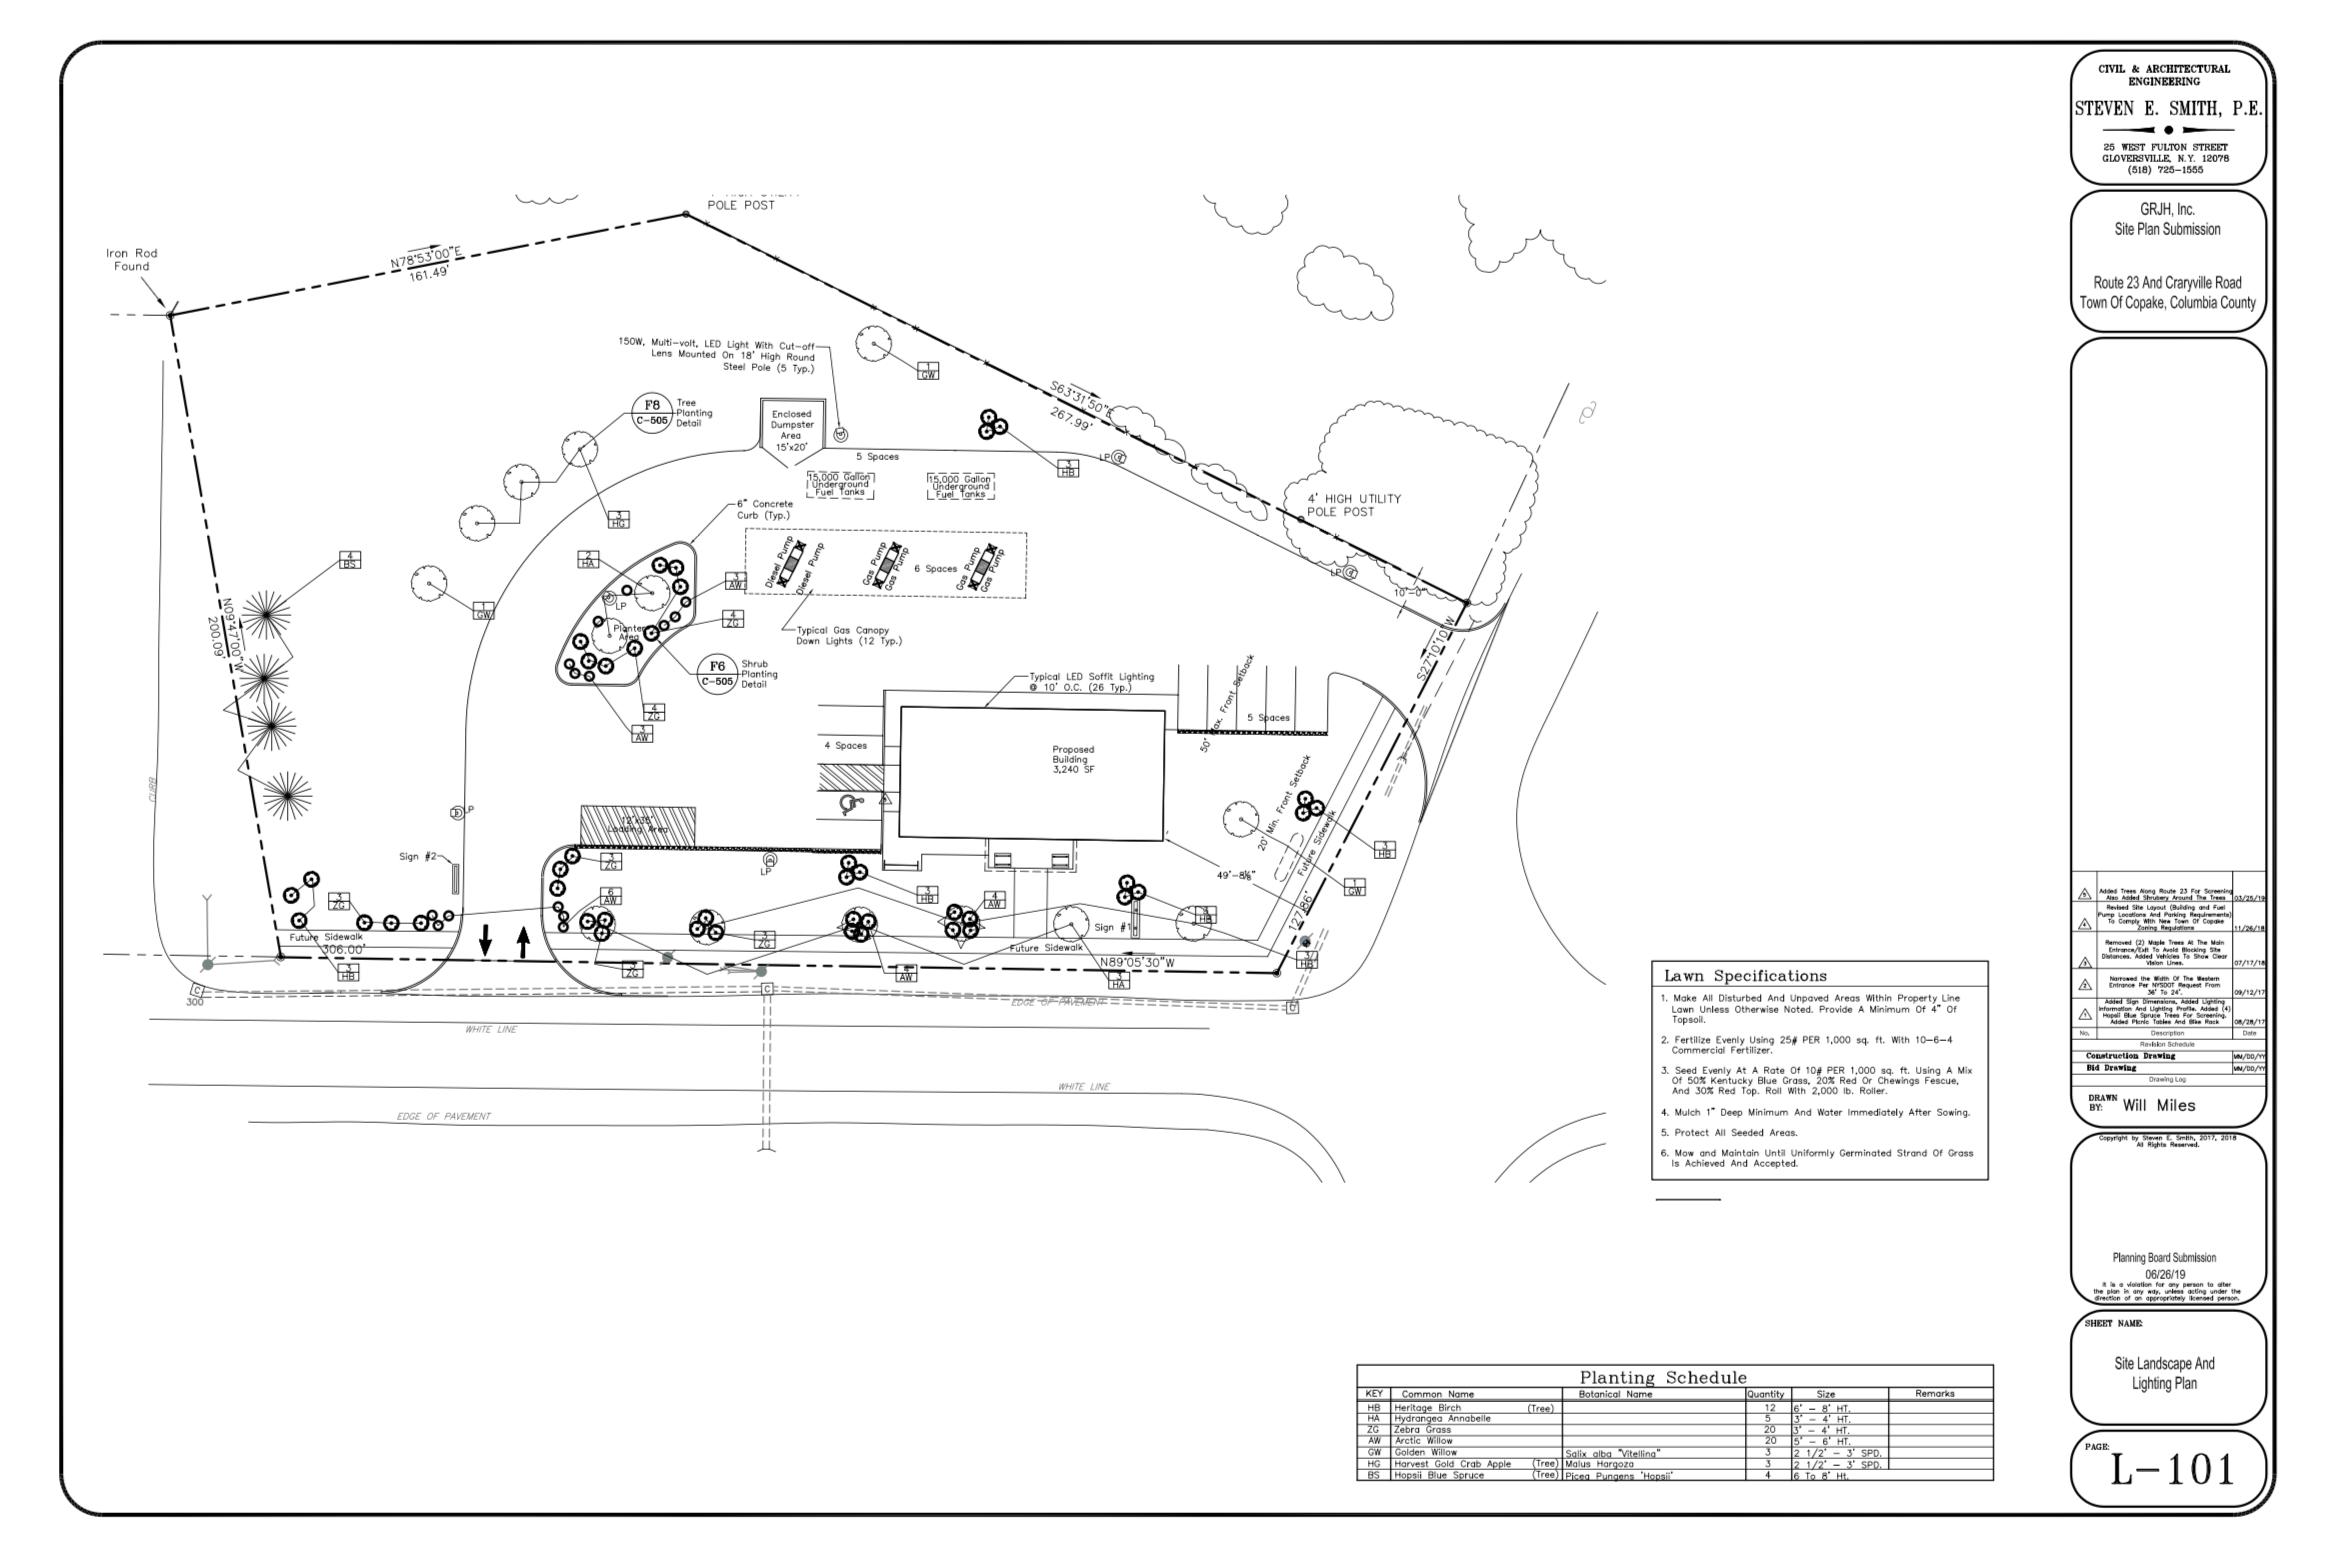 Site Plans GRJH Cobble Pond Gas Station_13.jpg